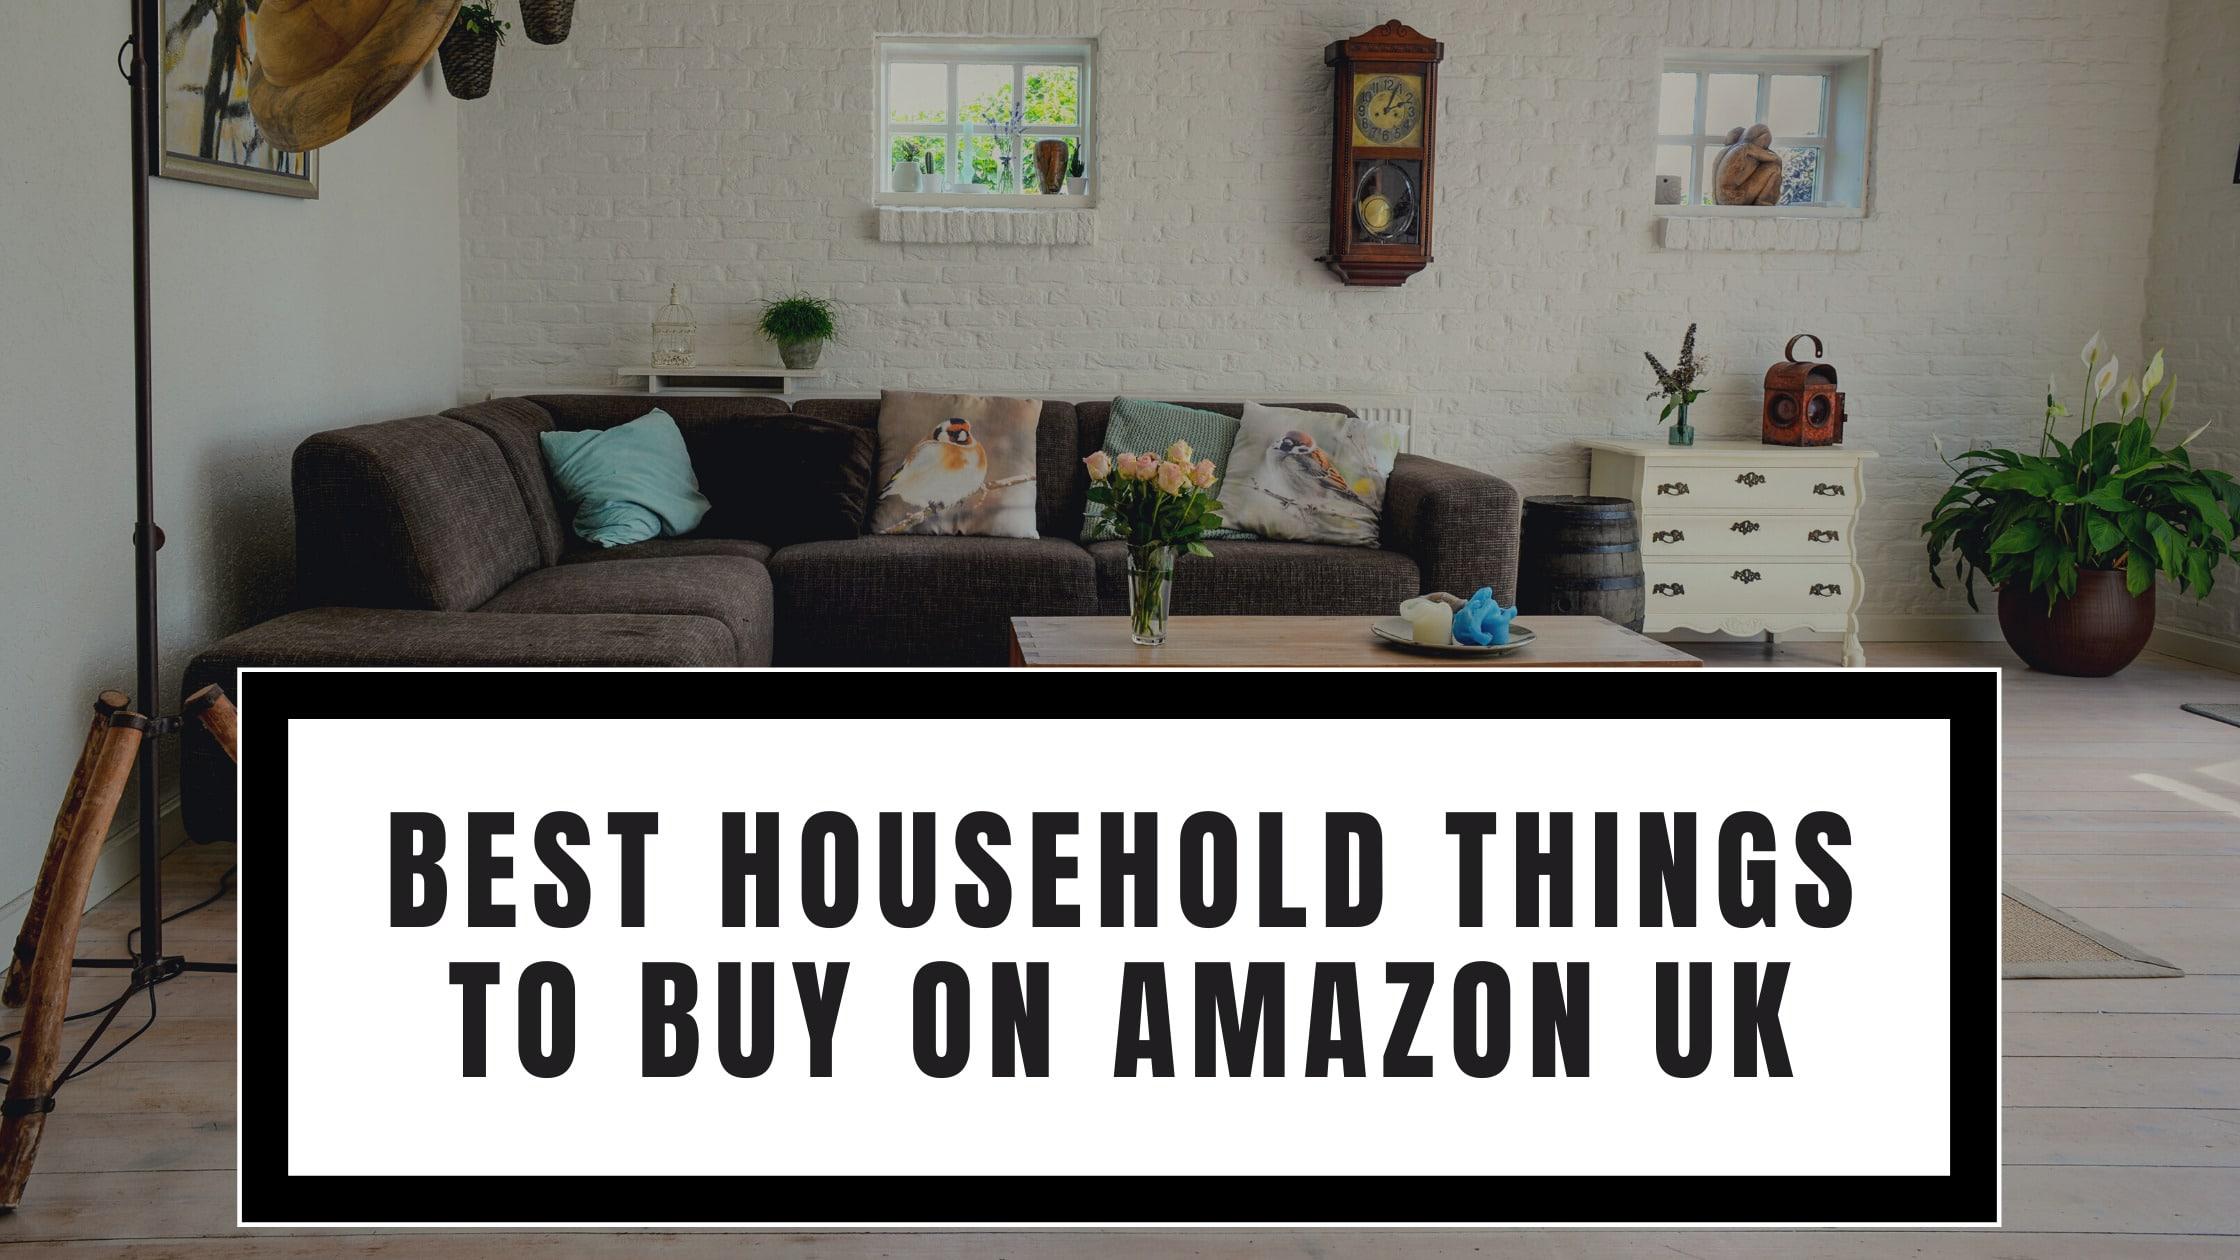 Best Household Things to Buy on Amazon UK